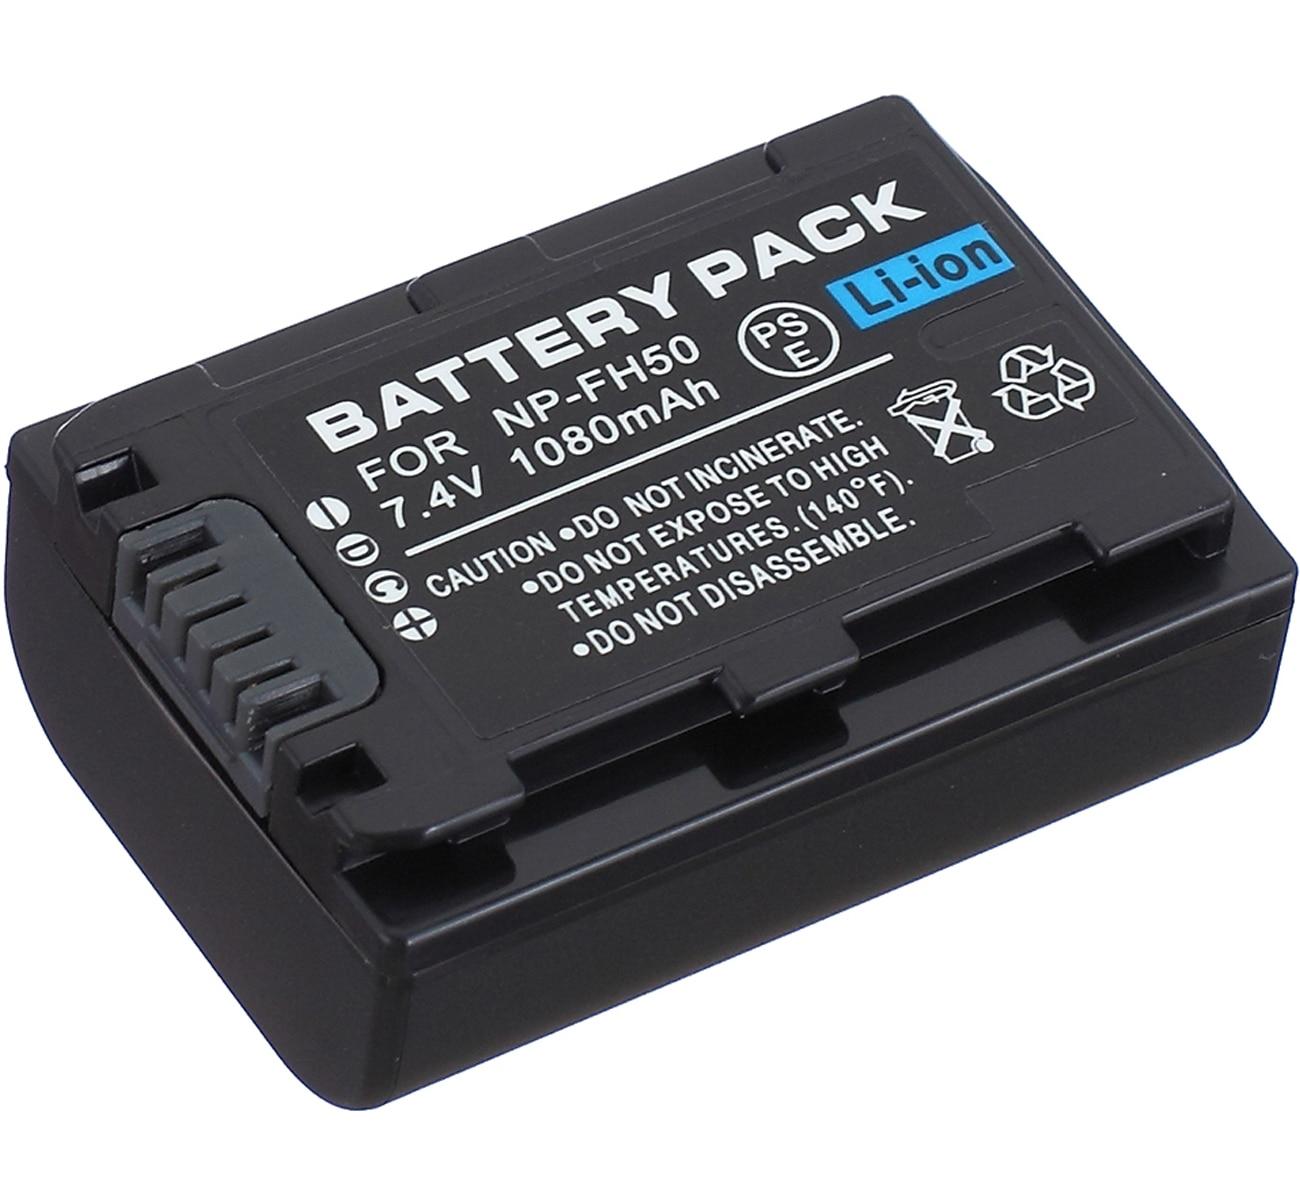 Paquete de batería para videocámara Sony DCR-DVD110E, DVD310E, DVD410E, DVD510E, DVD610E, DVD710E,...